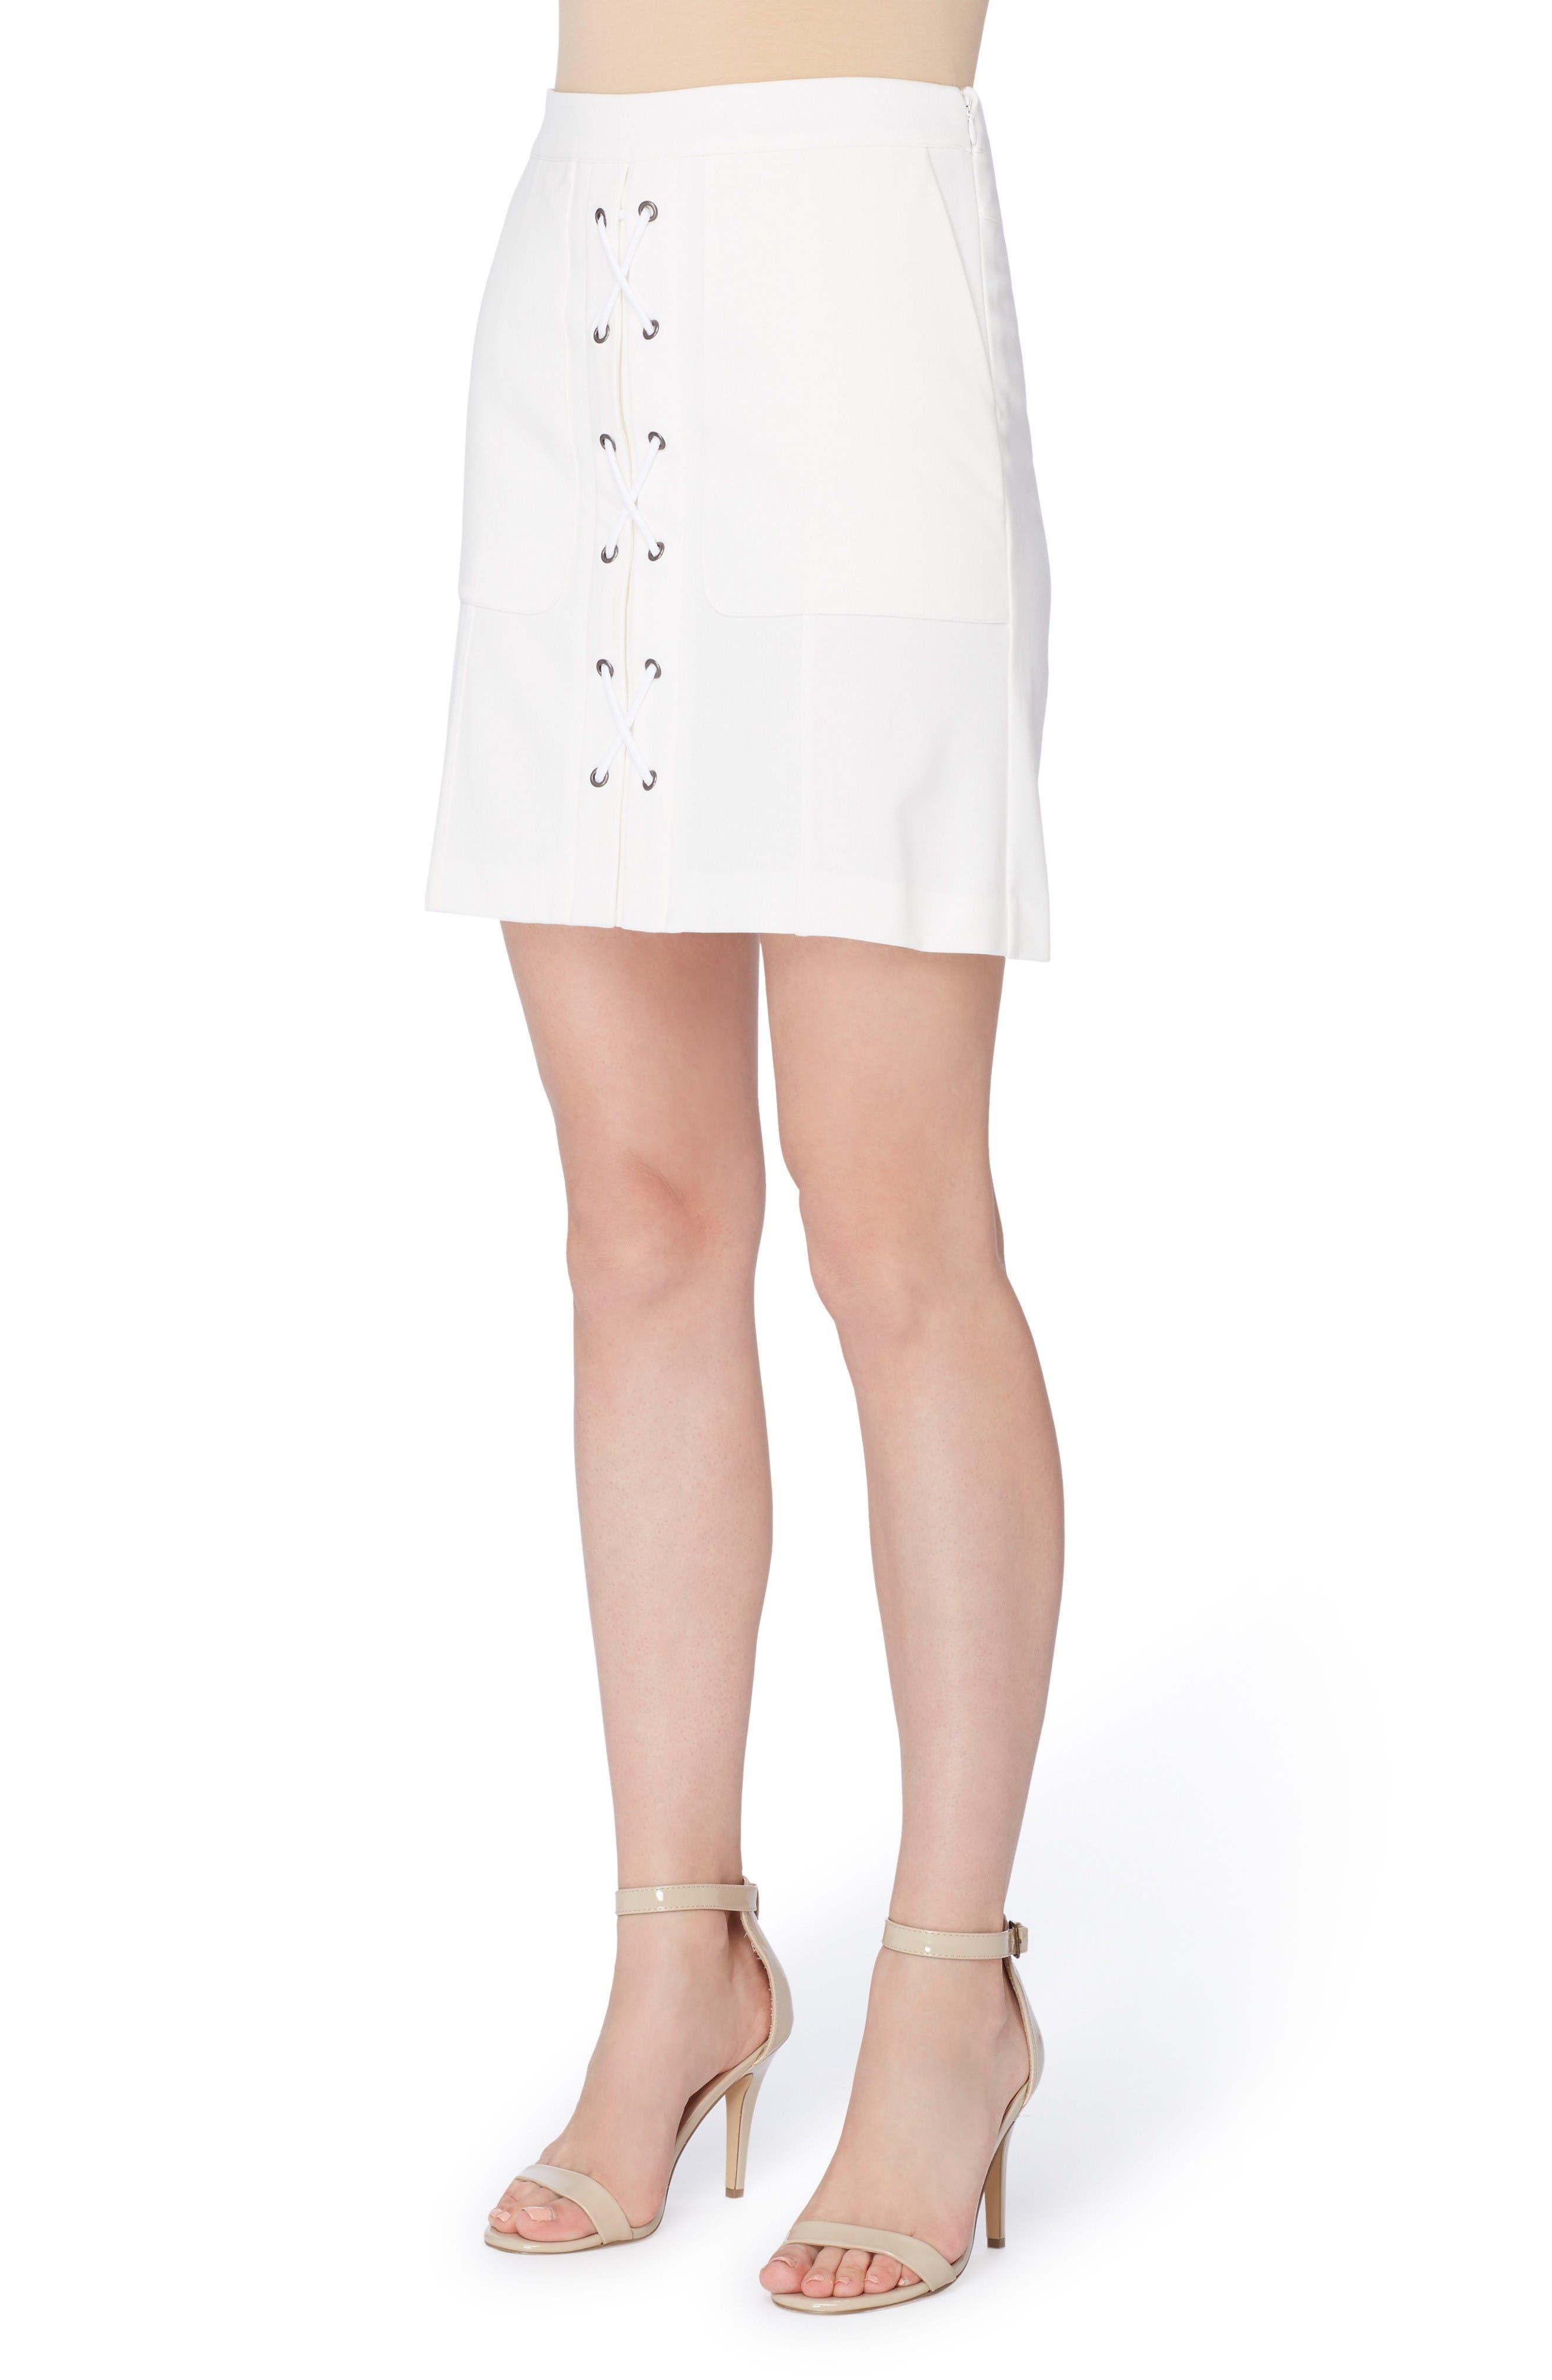 Catherine Catherine Malandrino Arry Lace-Up Skirt